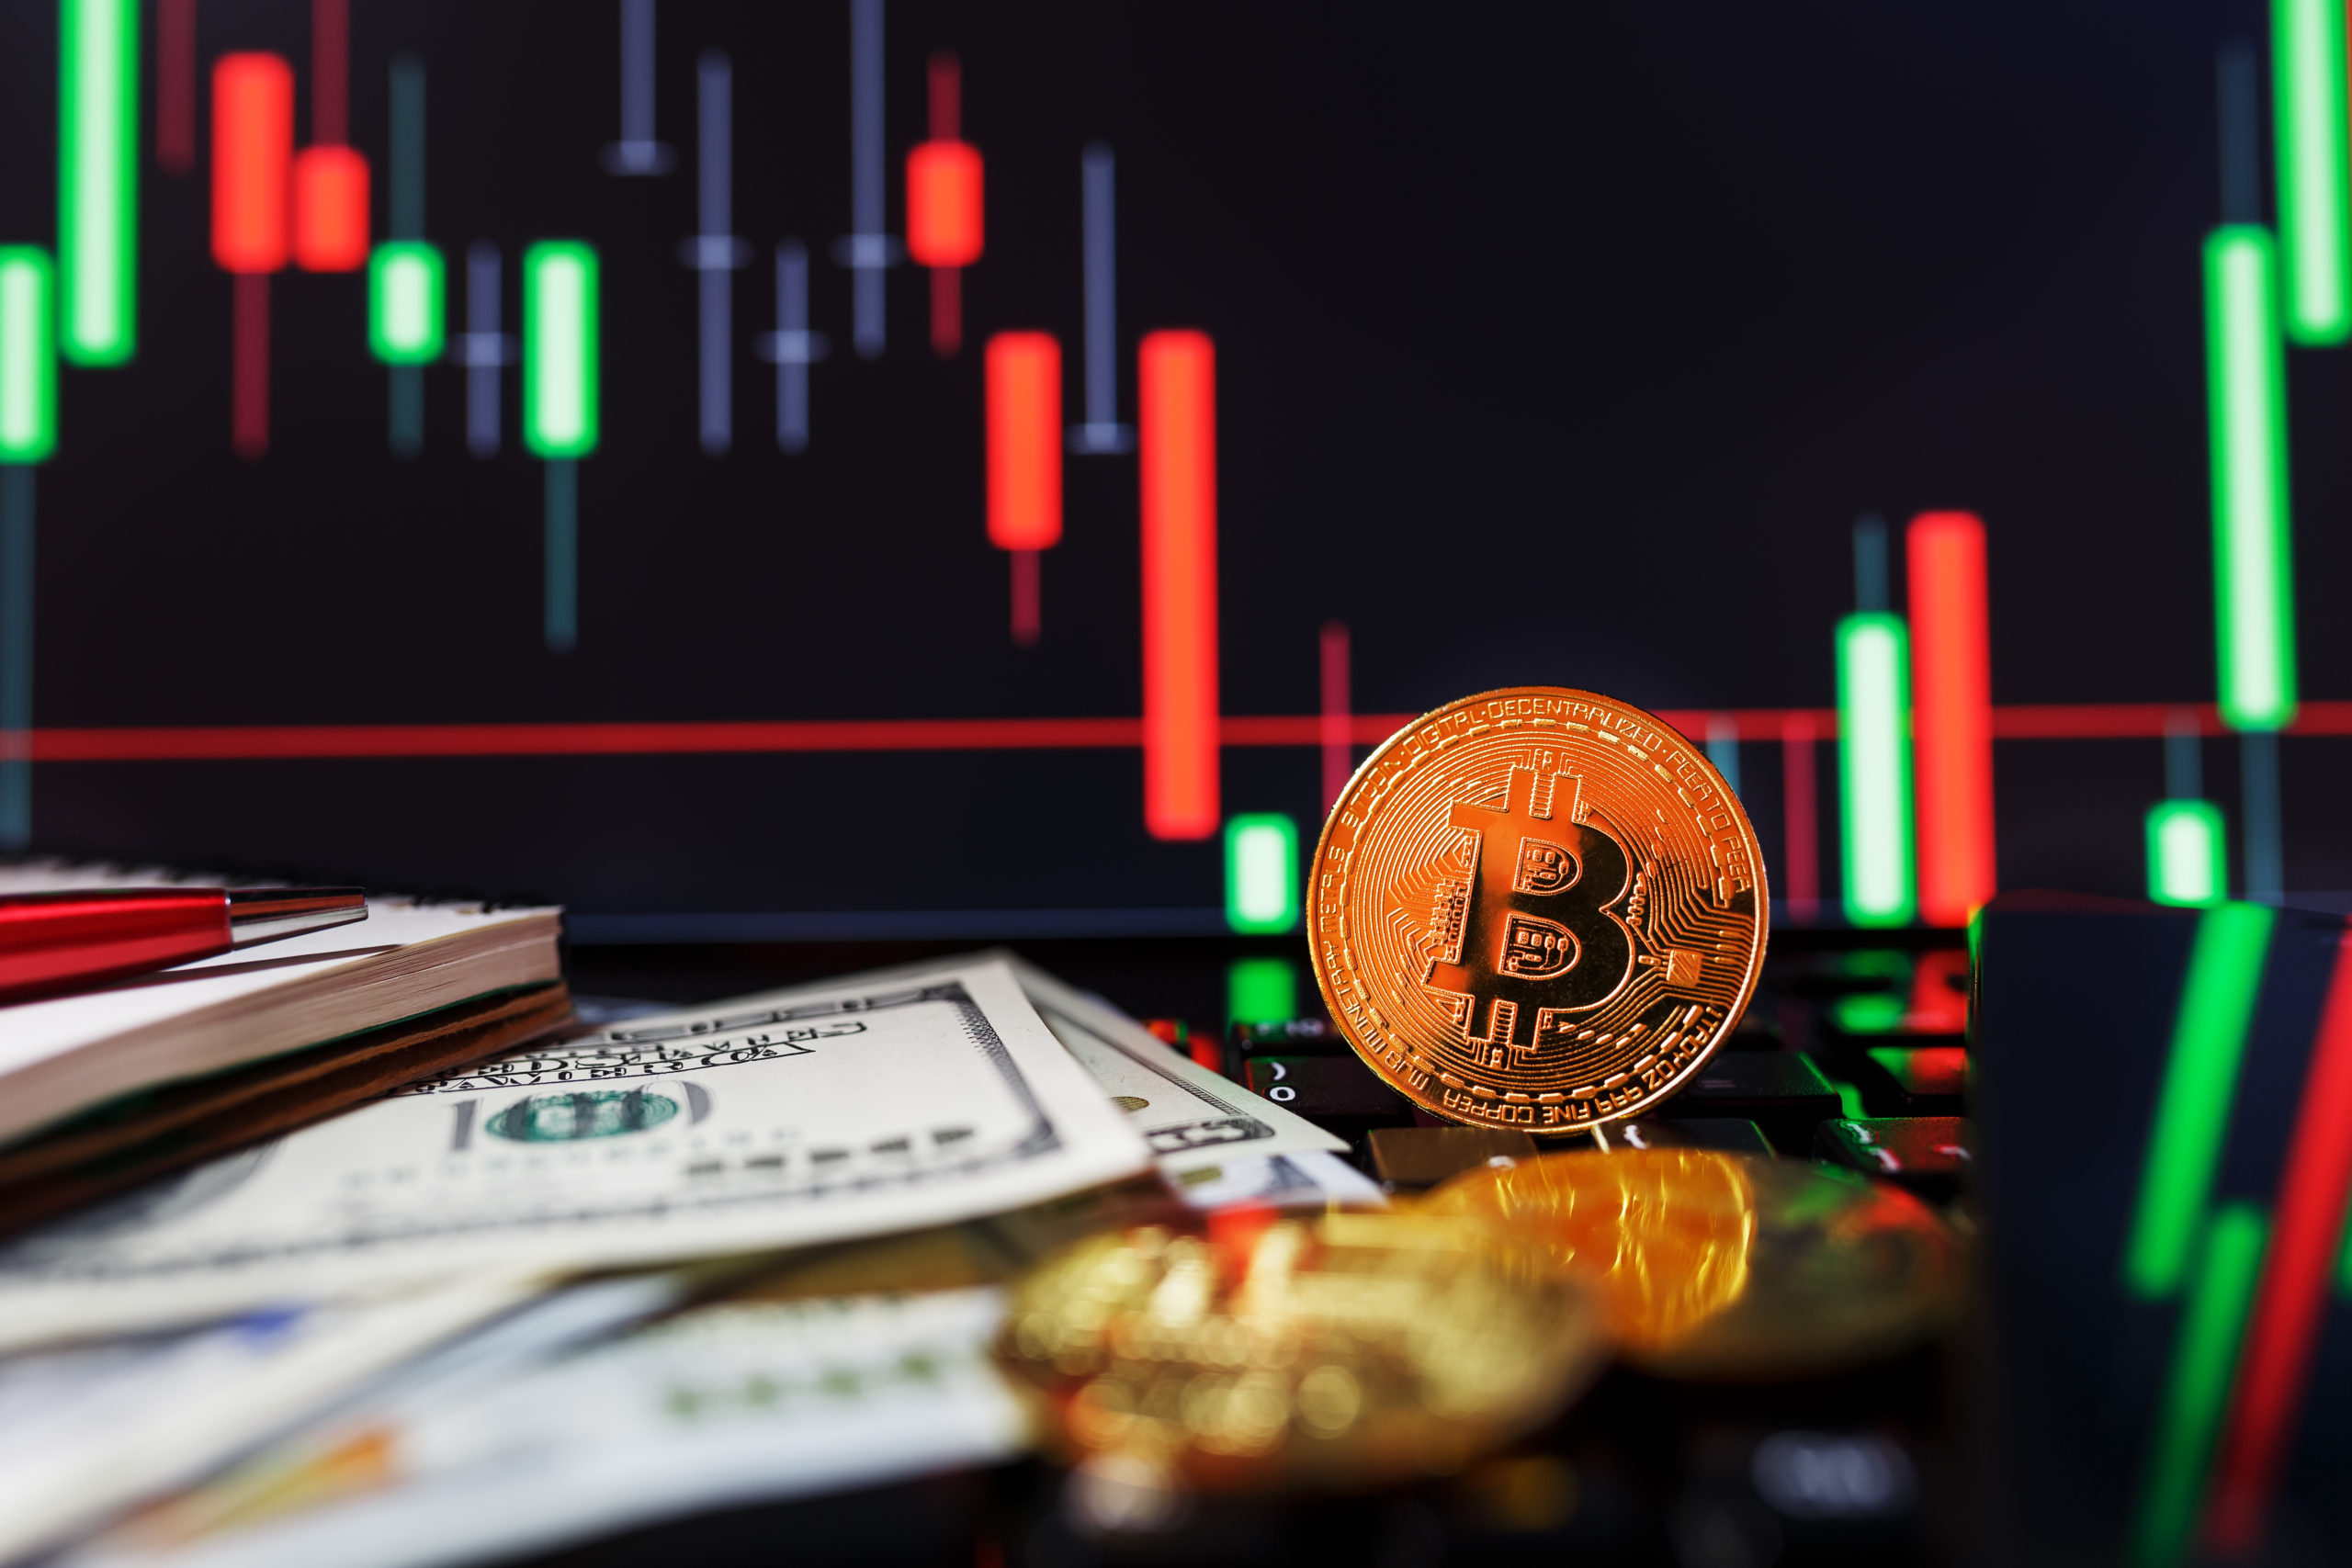 bitcoinin dolar bazinda teknik analizi 11 ocak 2021